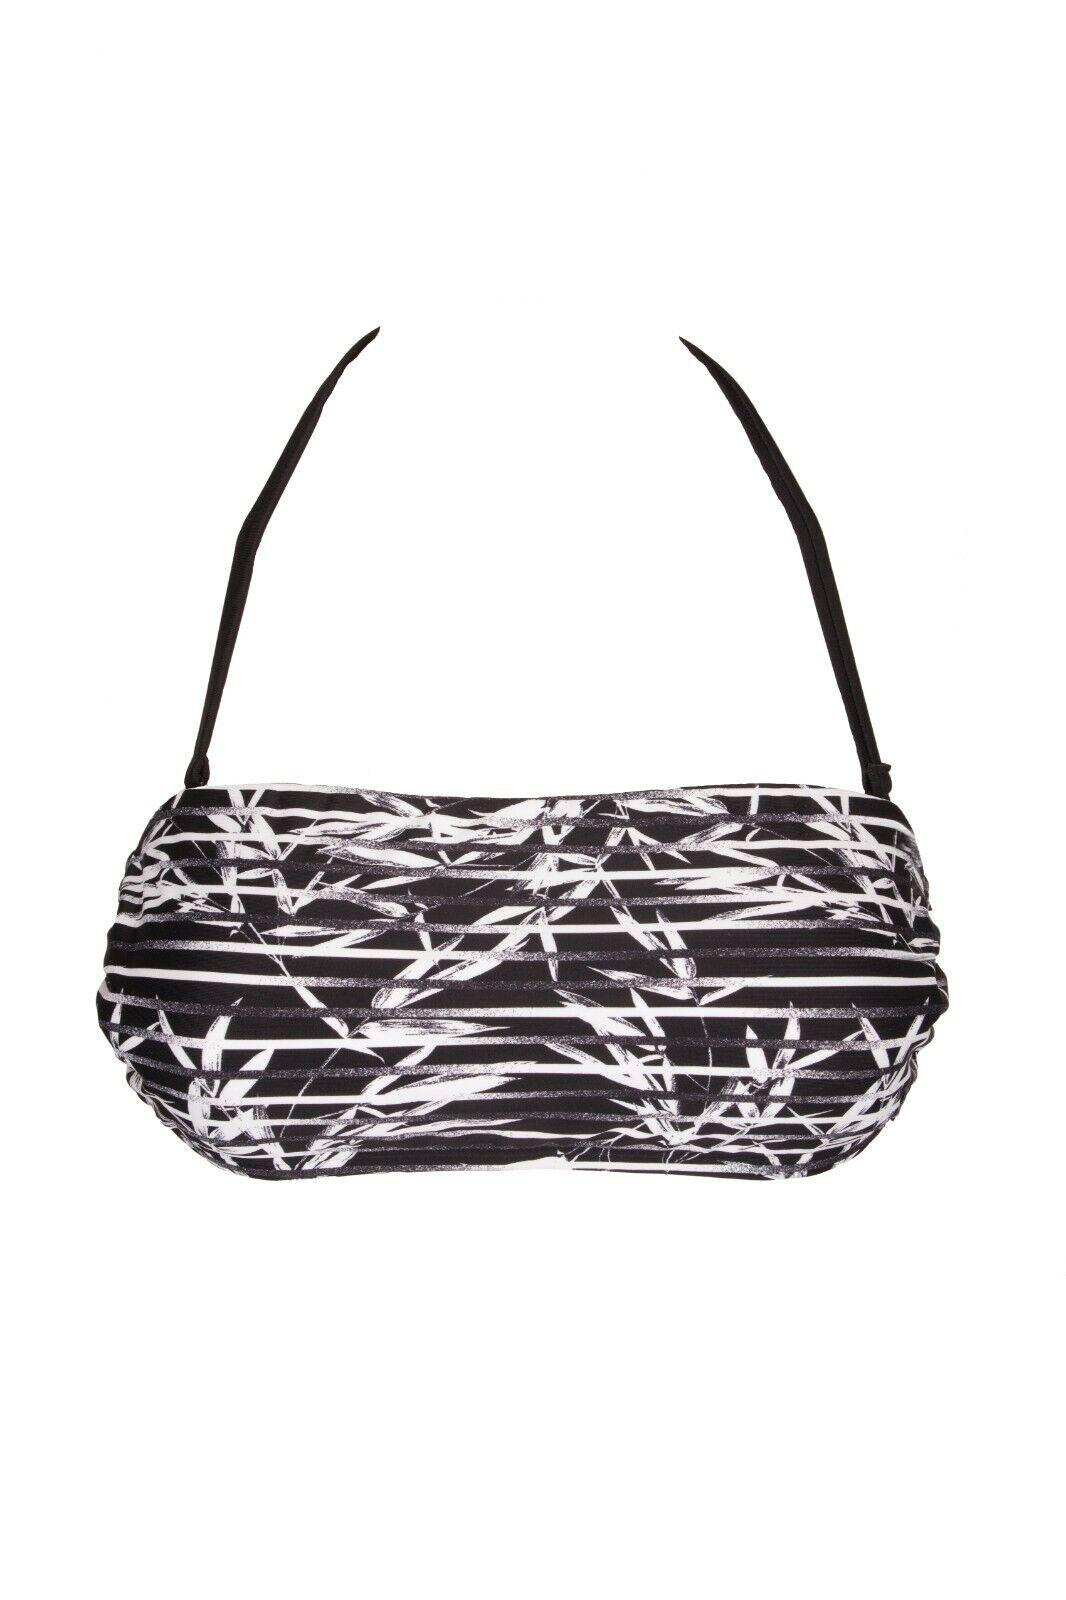 Ladies Bandeau Top Bikini Cup: C/D Black Venice Beach New Size 34 36 38 40